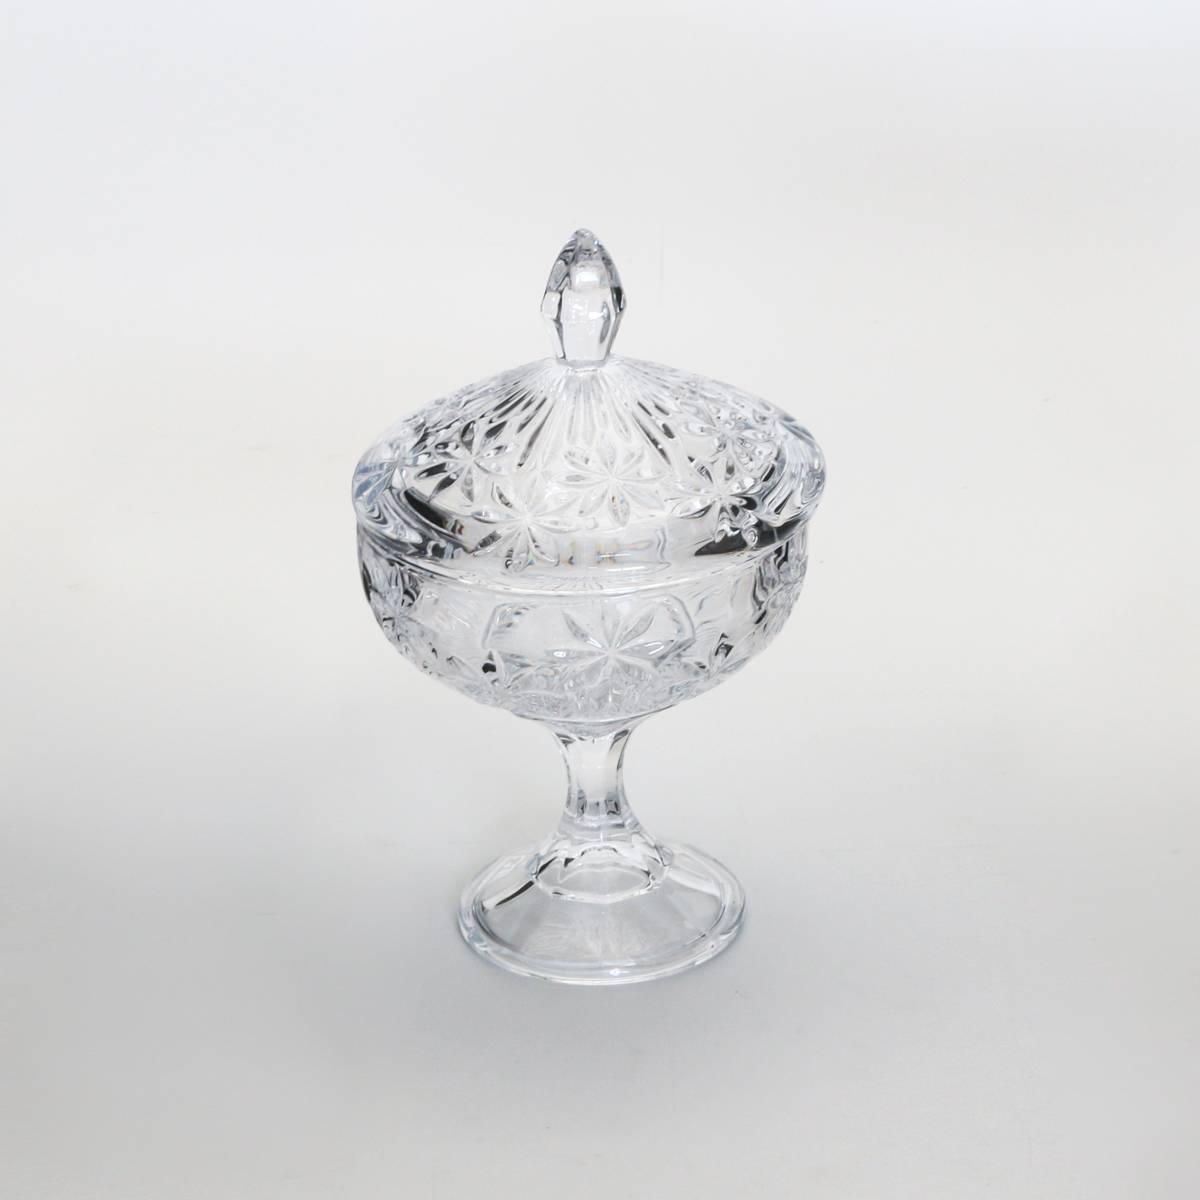 Bomboniere Perseus com Pé em Cristal - Bohemia Crystalite - 24x15 cm